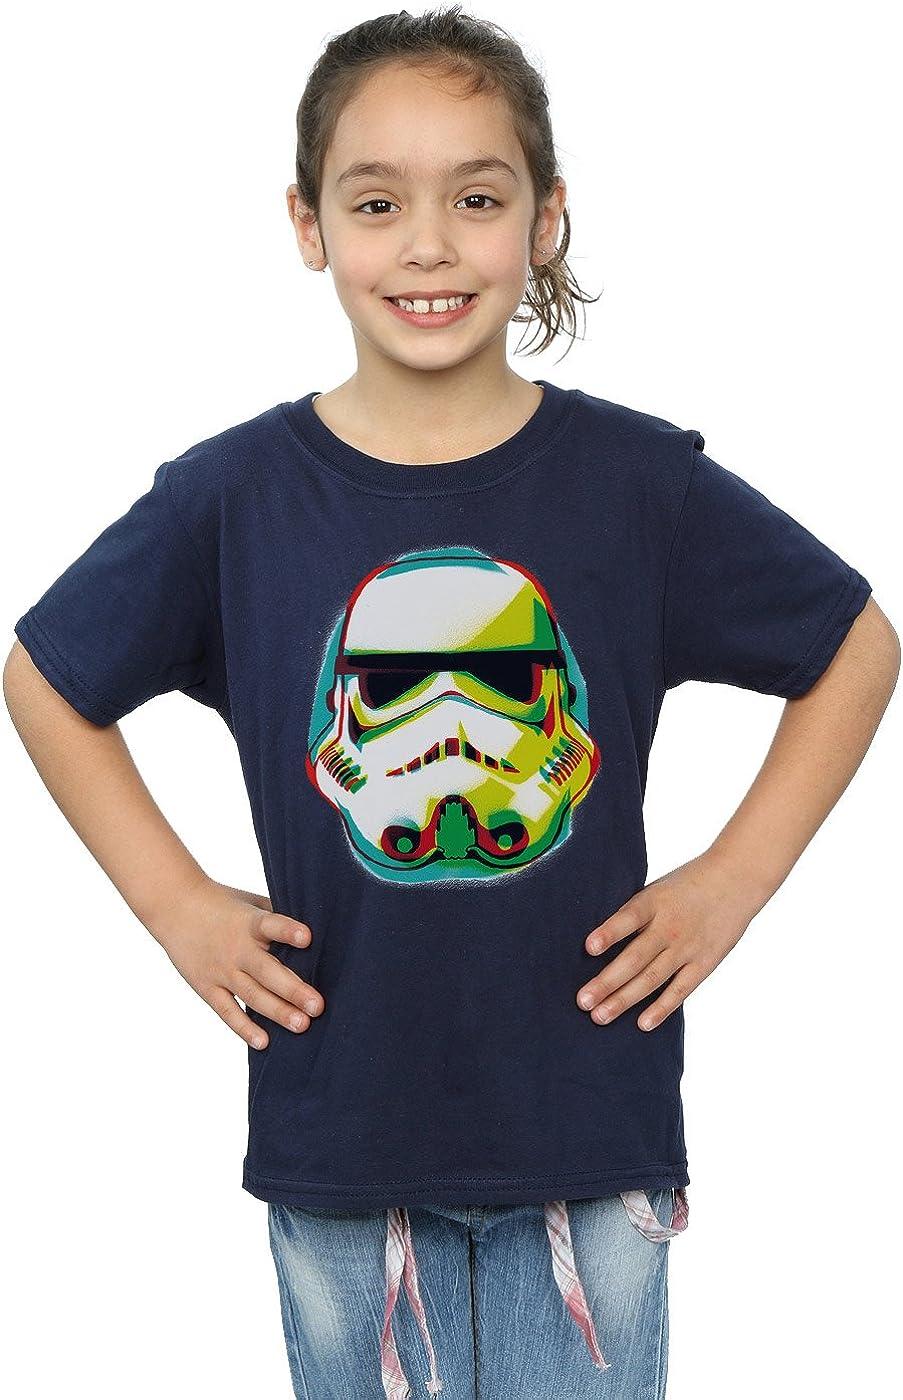 STAR WARS Girls Stormtrooper Command Grafitti T-Shirt 5-6 Years Navy Blue